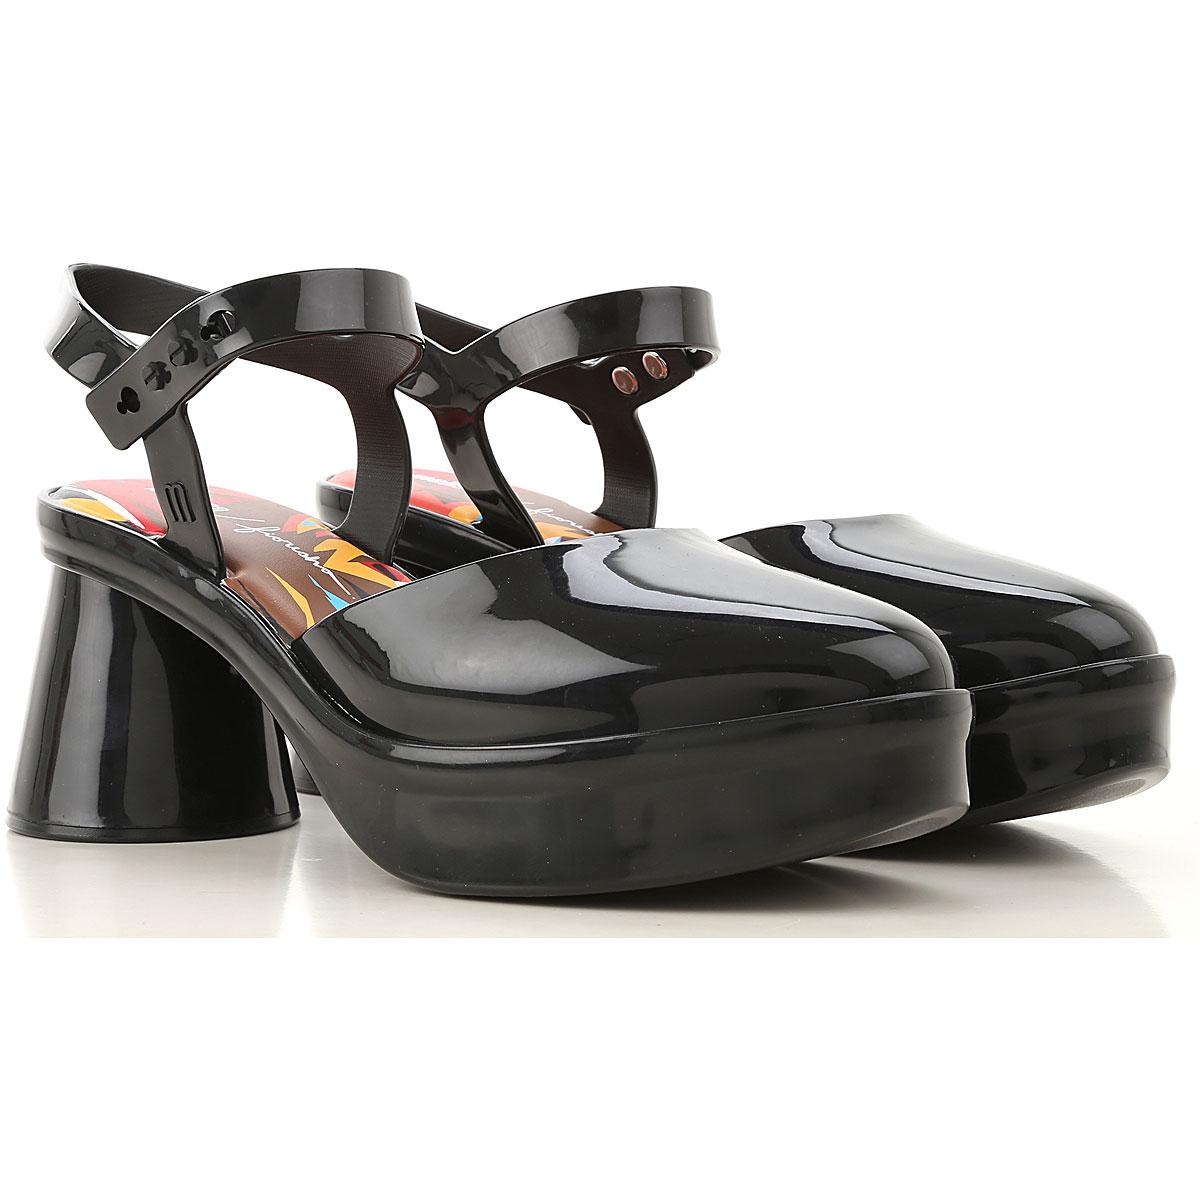 Melissa Pumps & High Heels for Women On Sale, Black, Rubber, 2019, USA 6 - EUR 37 USA 9 - EUR 40 USA 10 - EUR 41/42